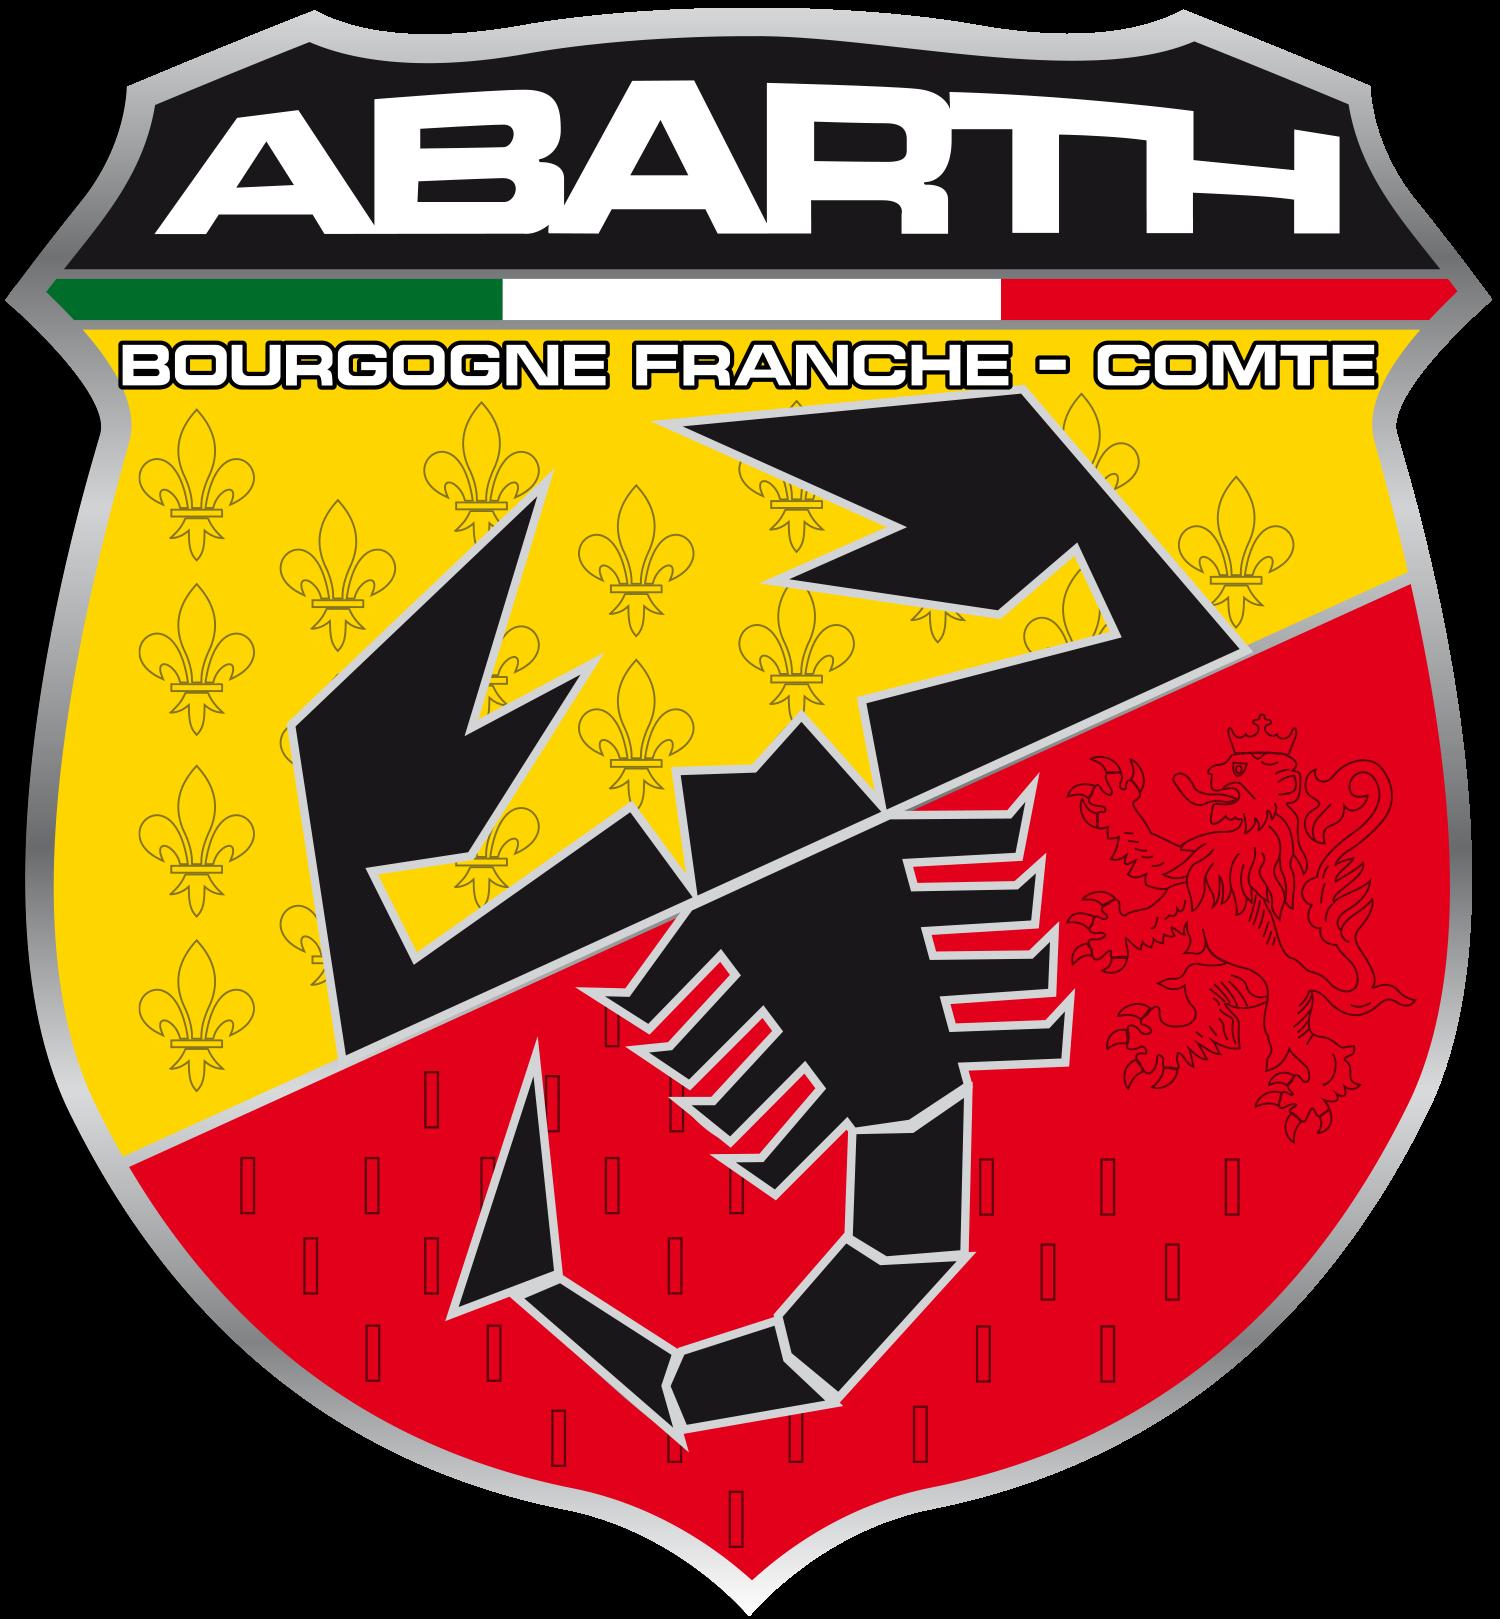 Abarth Club Bourgogne Franche-Comté